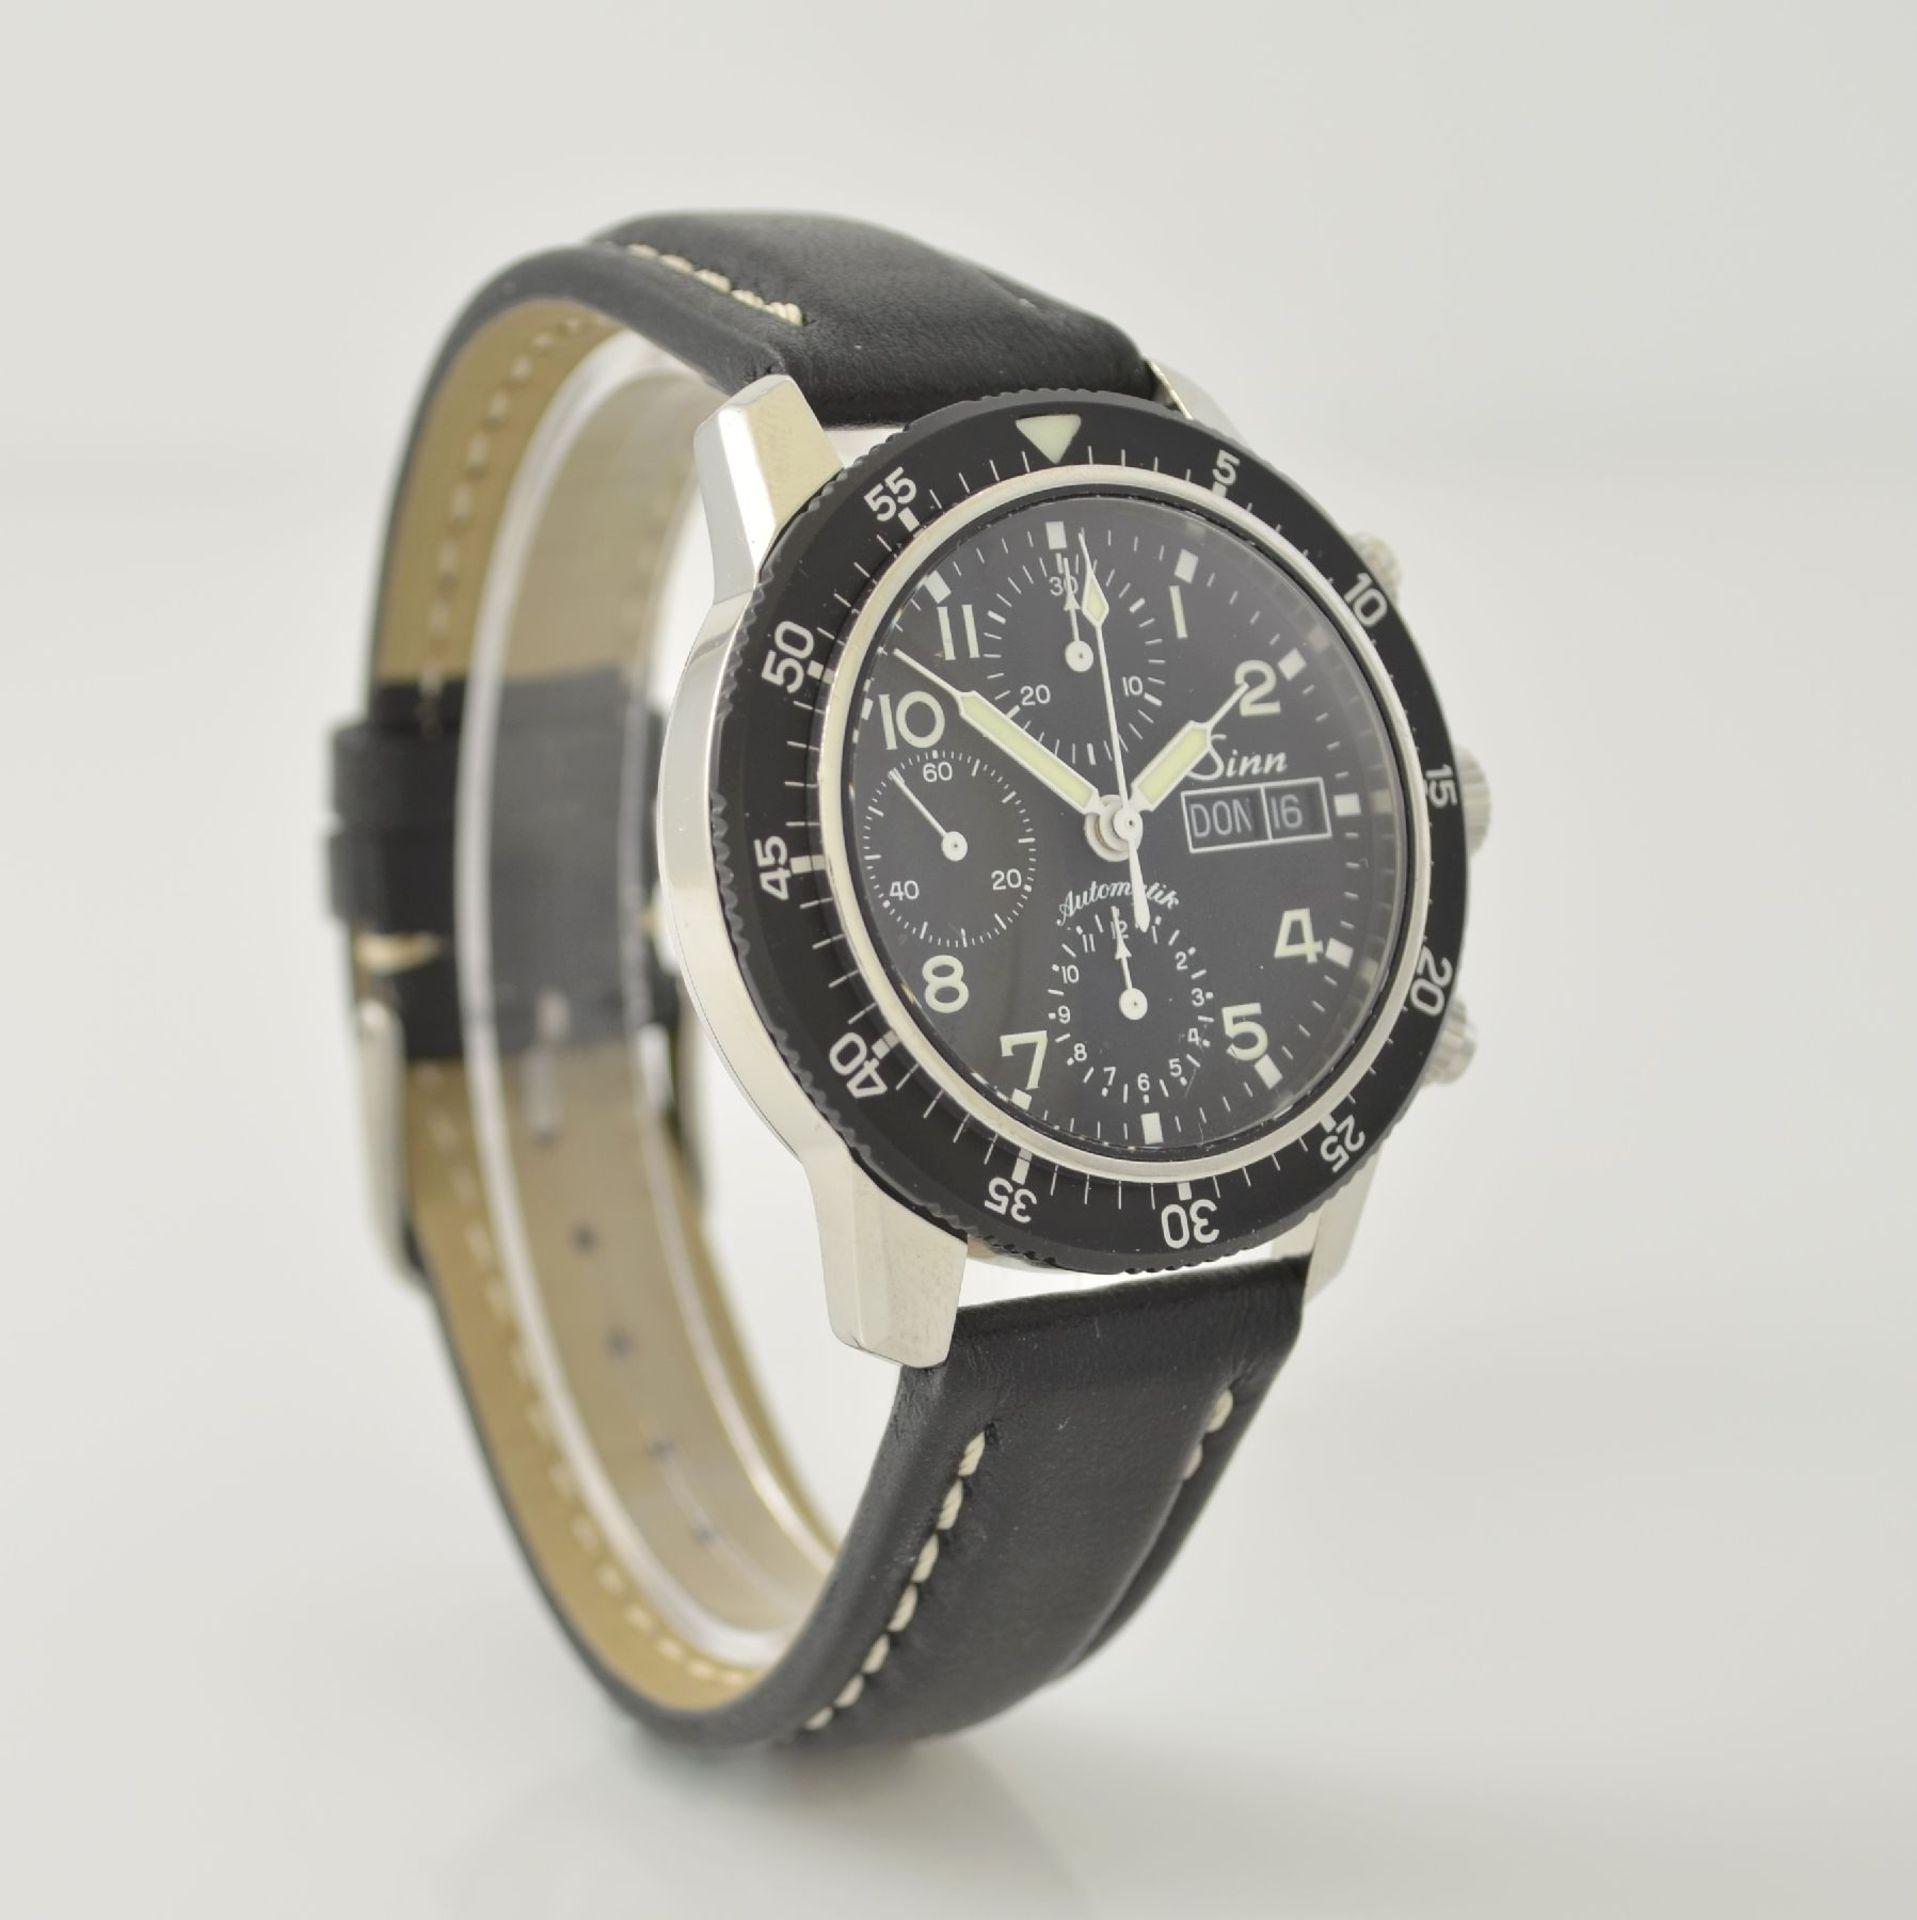 SINN Armbandchronograph, Automatik, Schweiz um 2010, pol. Edelstahlgeh. inkl. orig. Lederband m. - Bild 4 aus 6